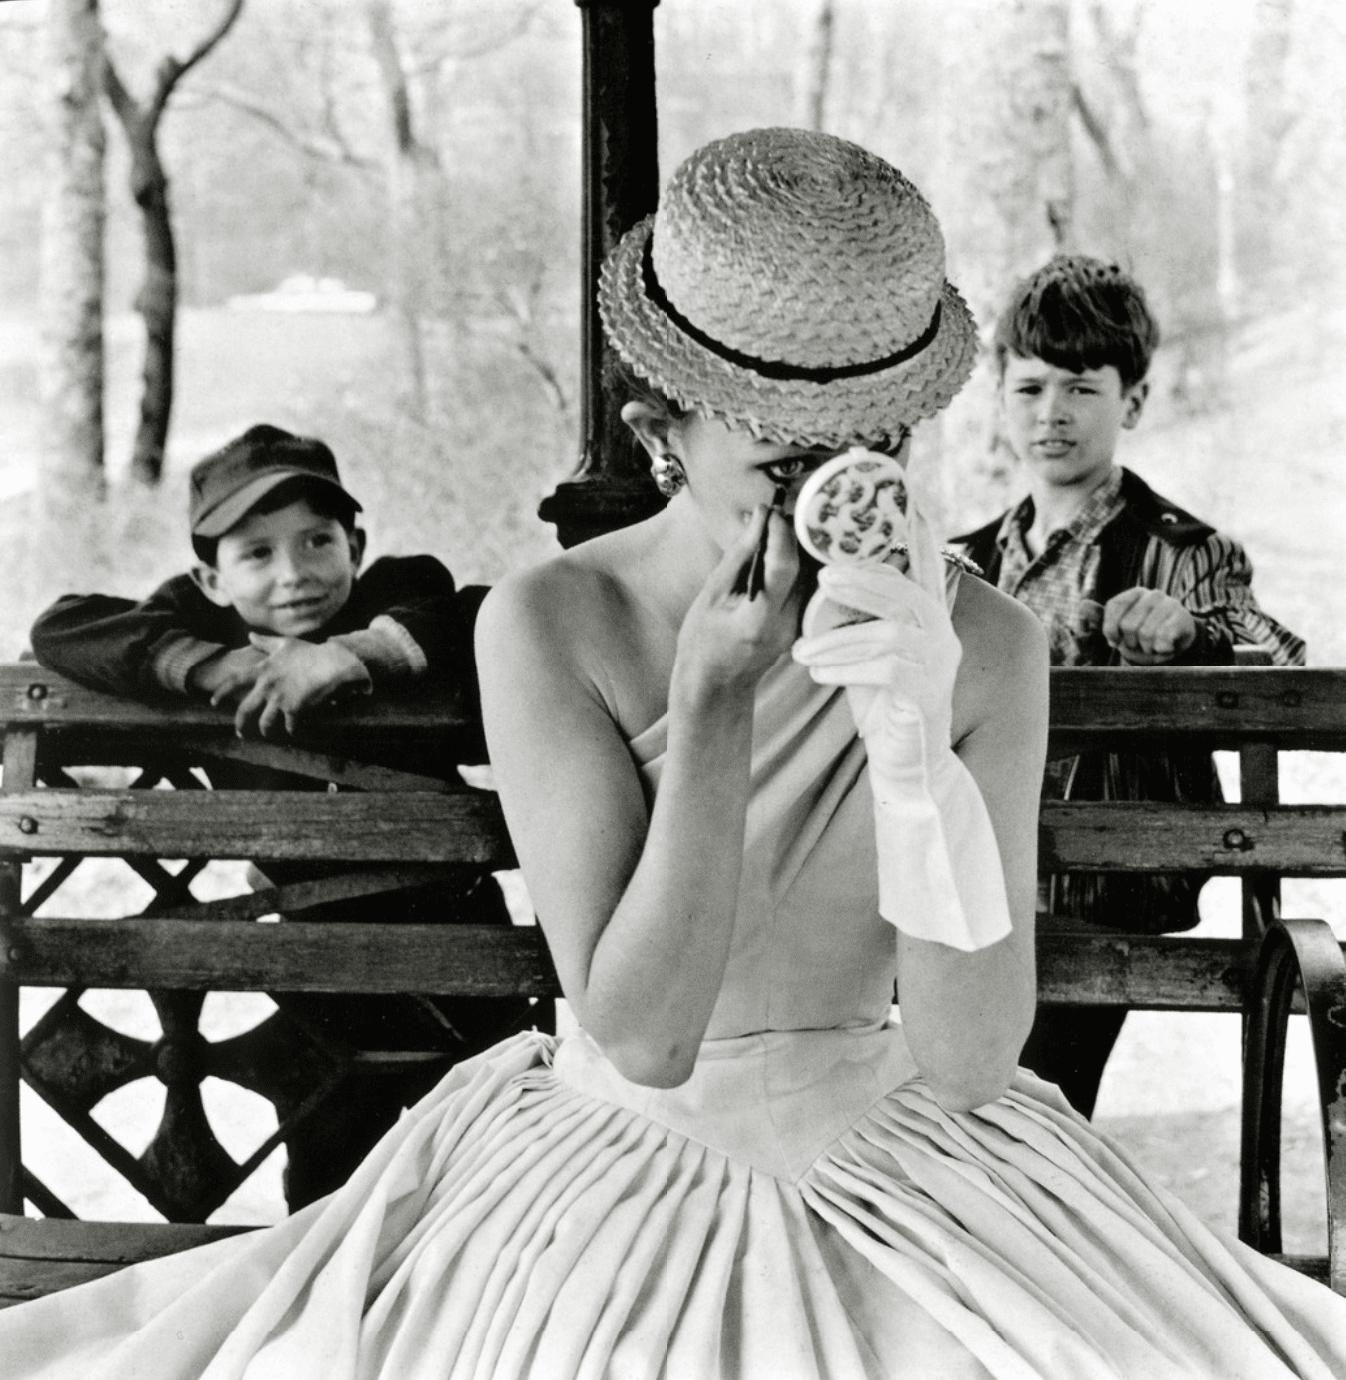 Frank Paulin, Model, Central Park